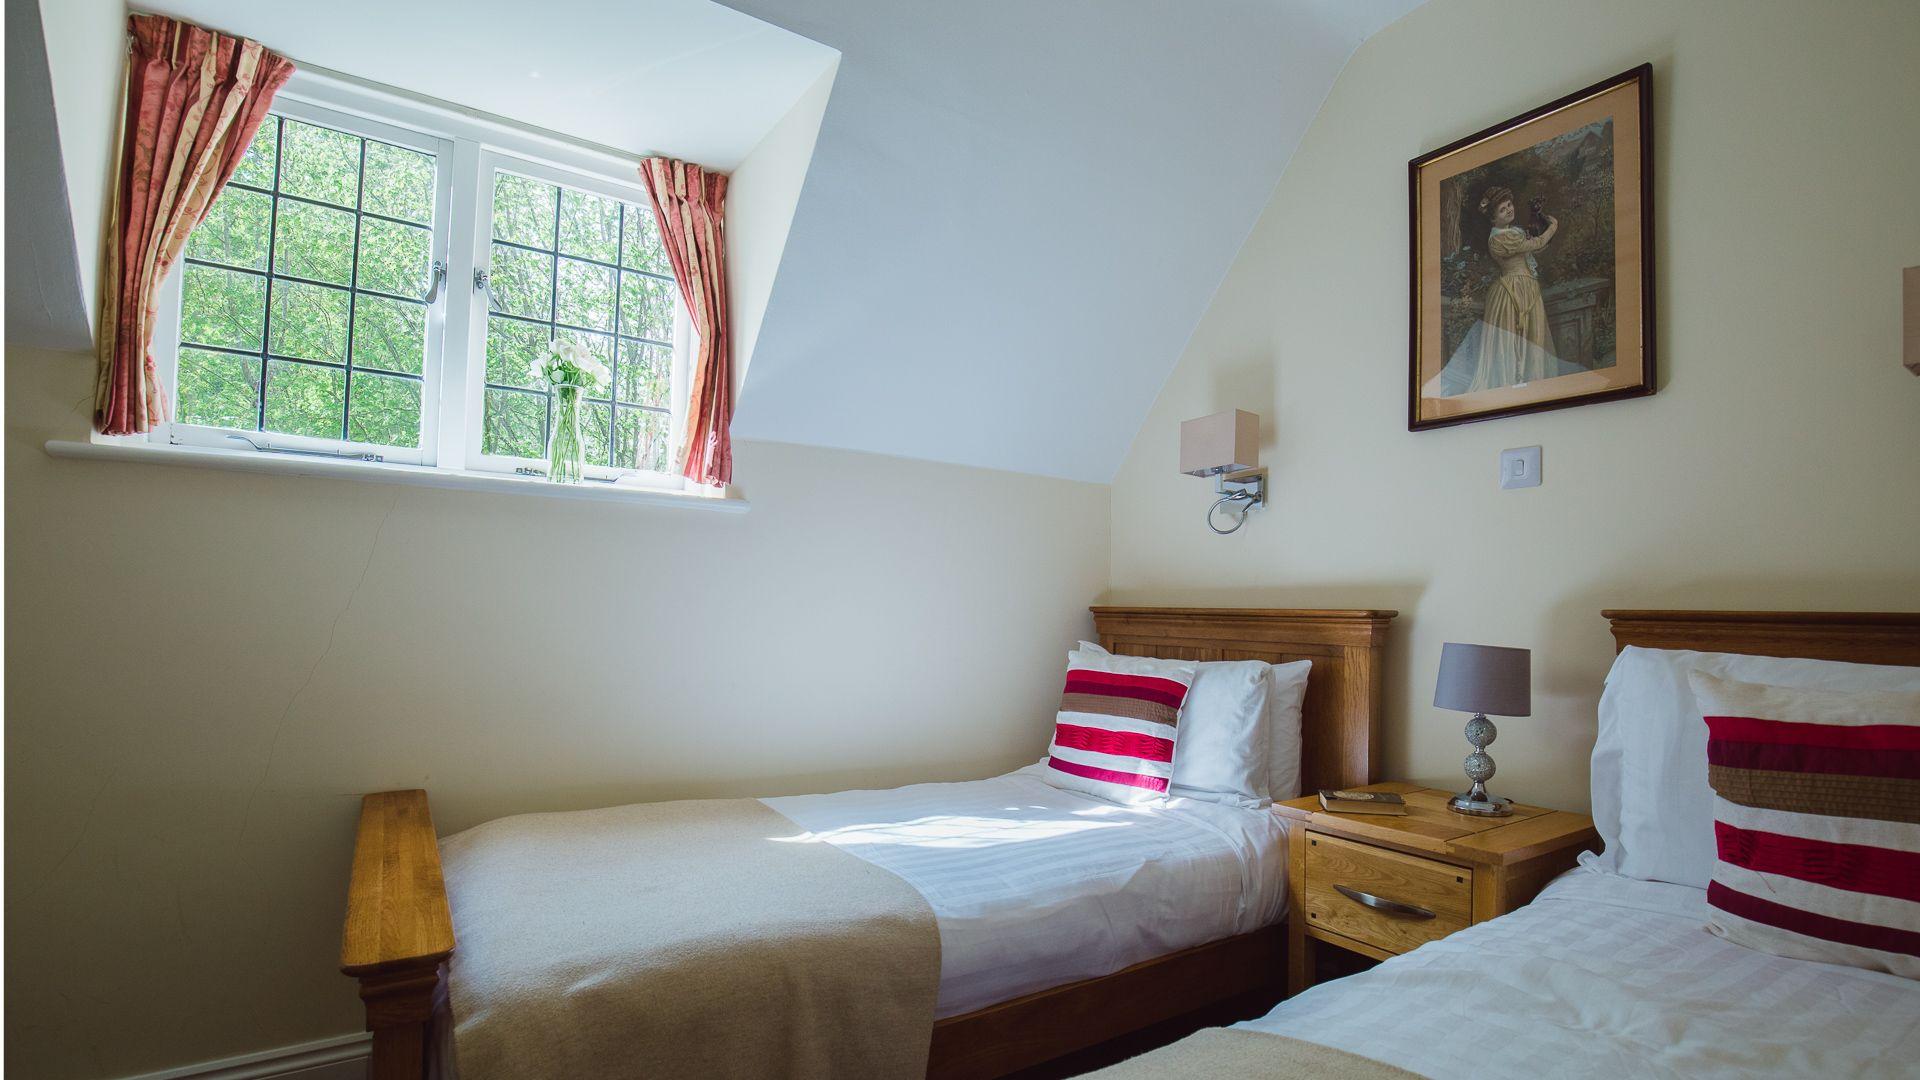 Bedroom Two,  Emma Dent Cottage at Sudeley Castle, Bolthole Retreats